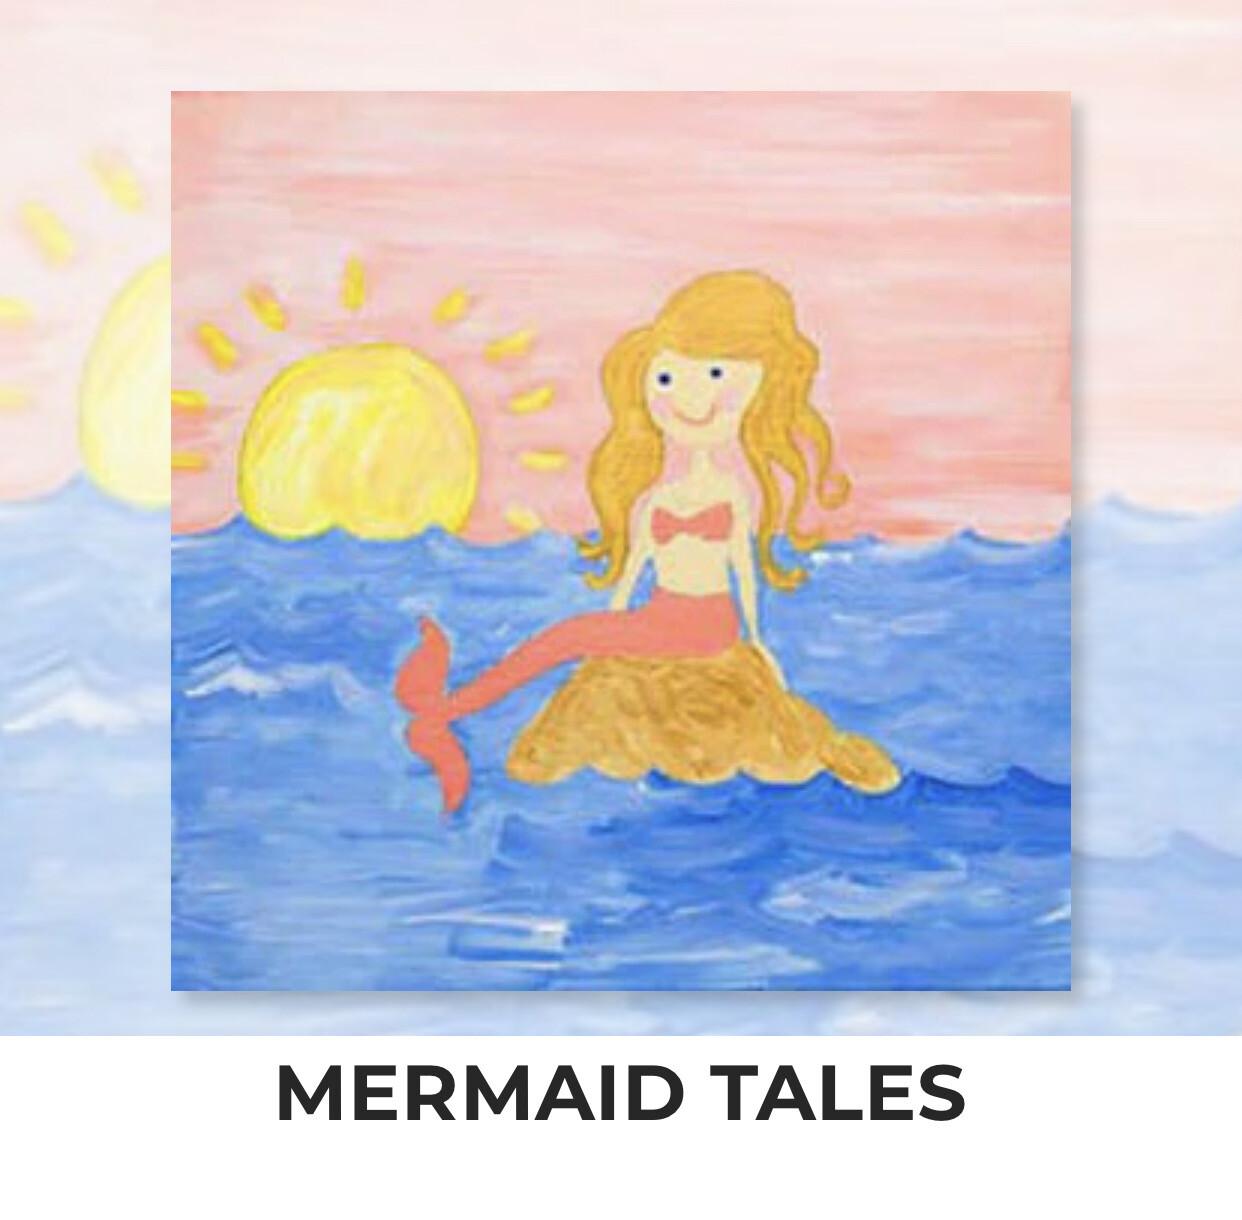 Mermaid Tails KIDS Acrylic Paint On Canvas DIY Art Kit - 3 Week Special Order